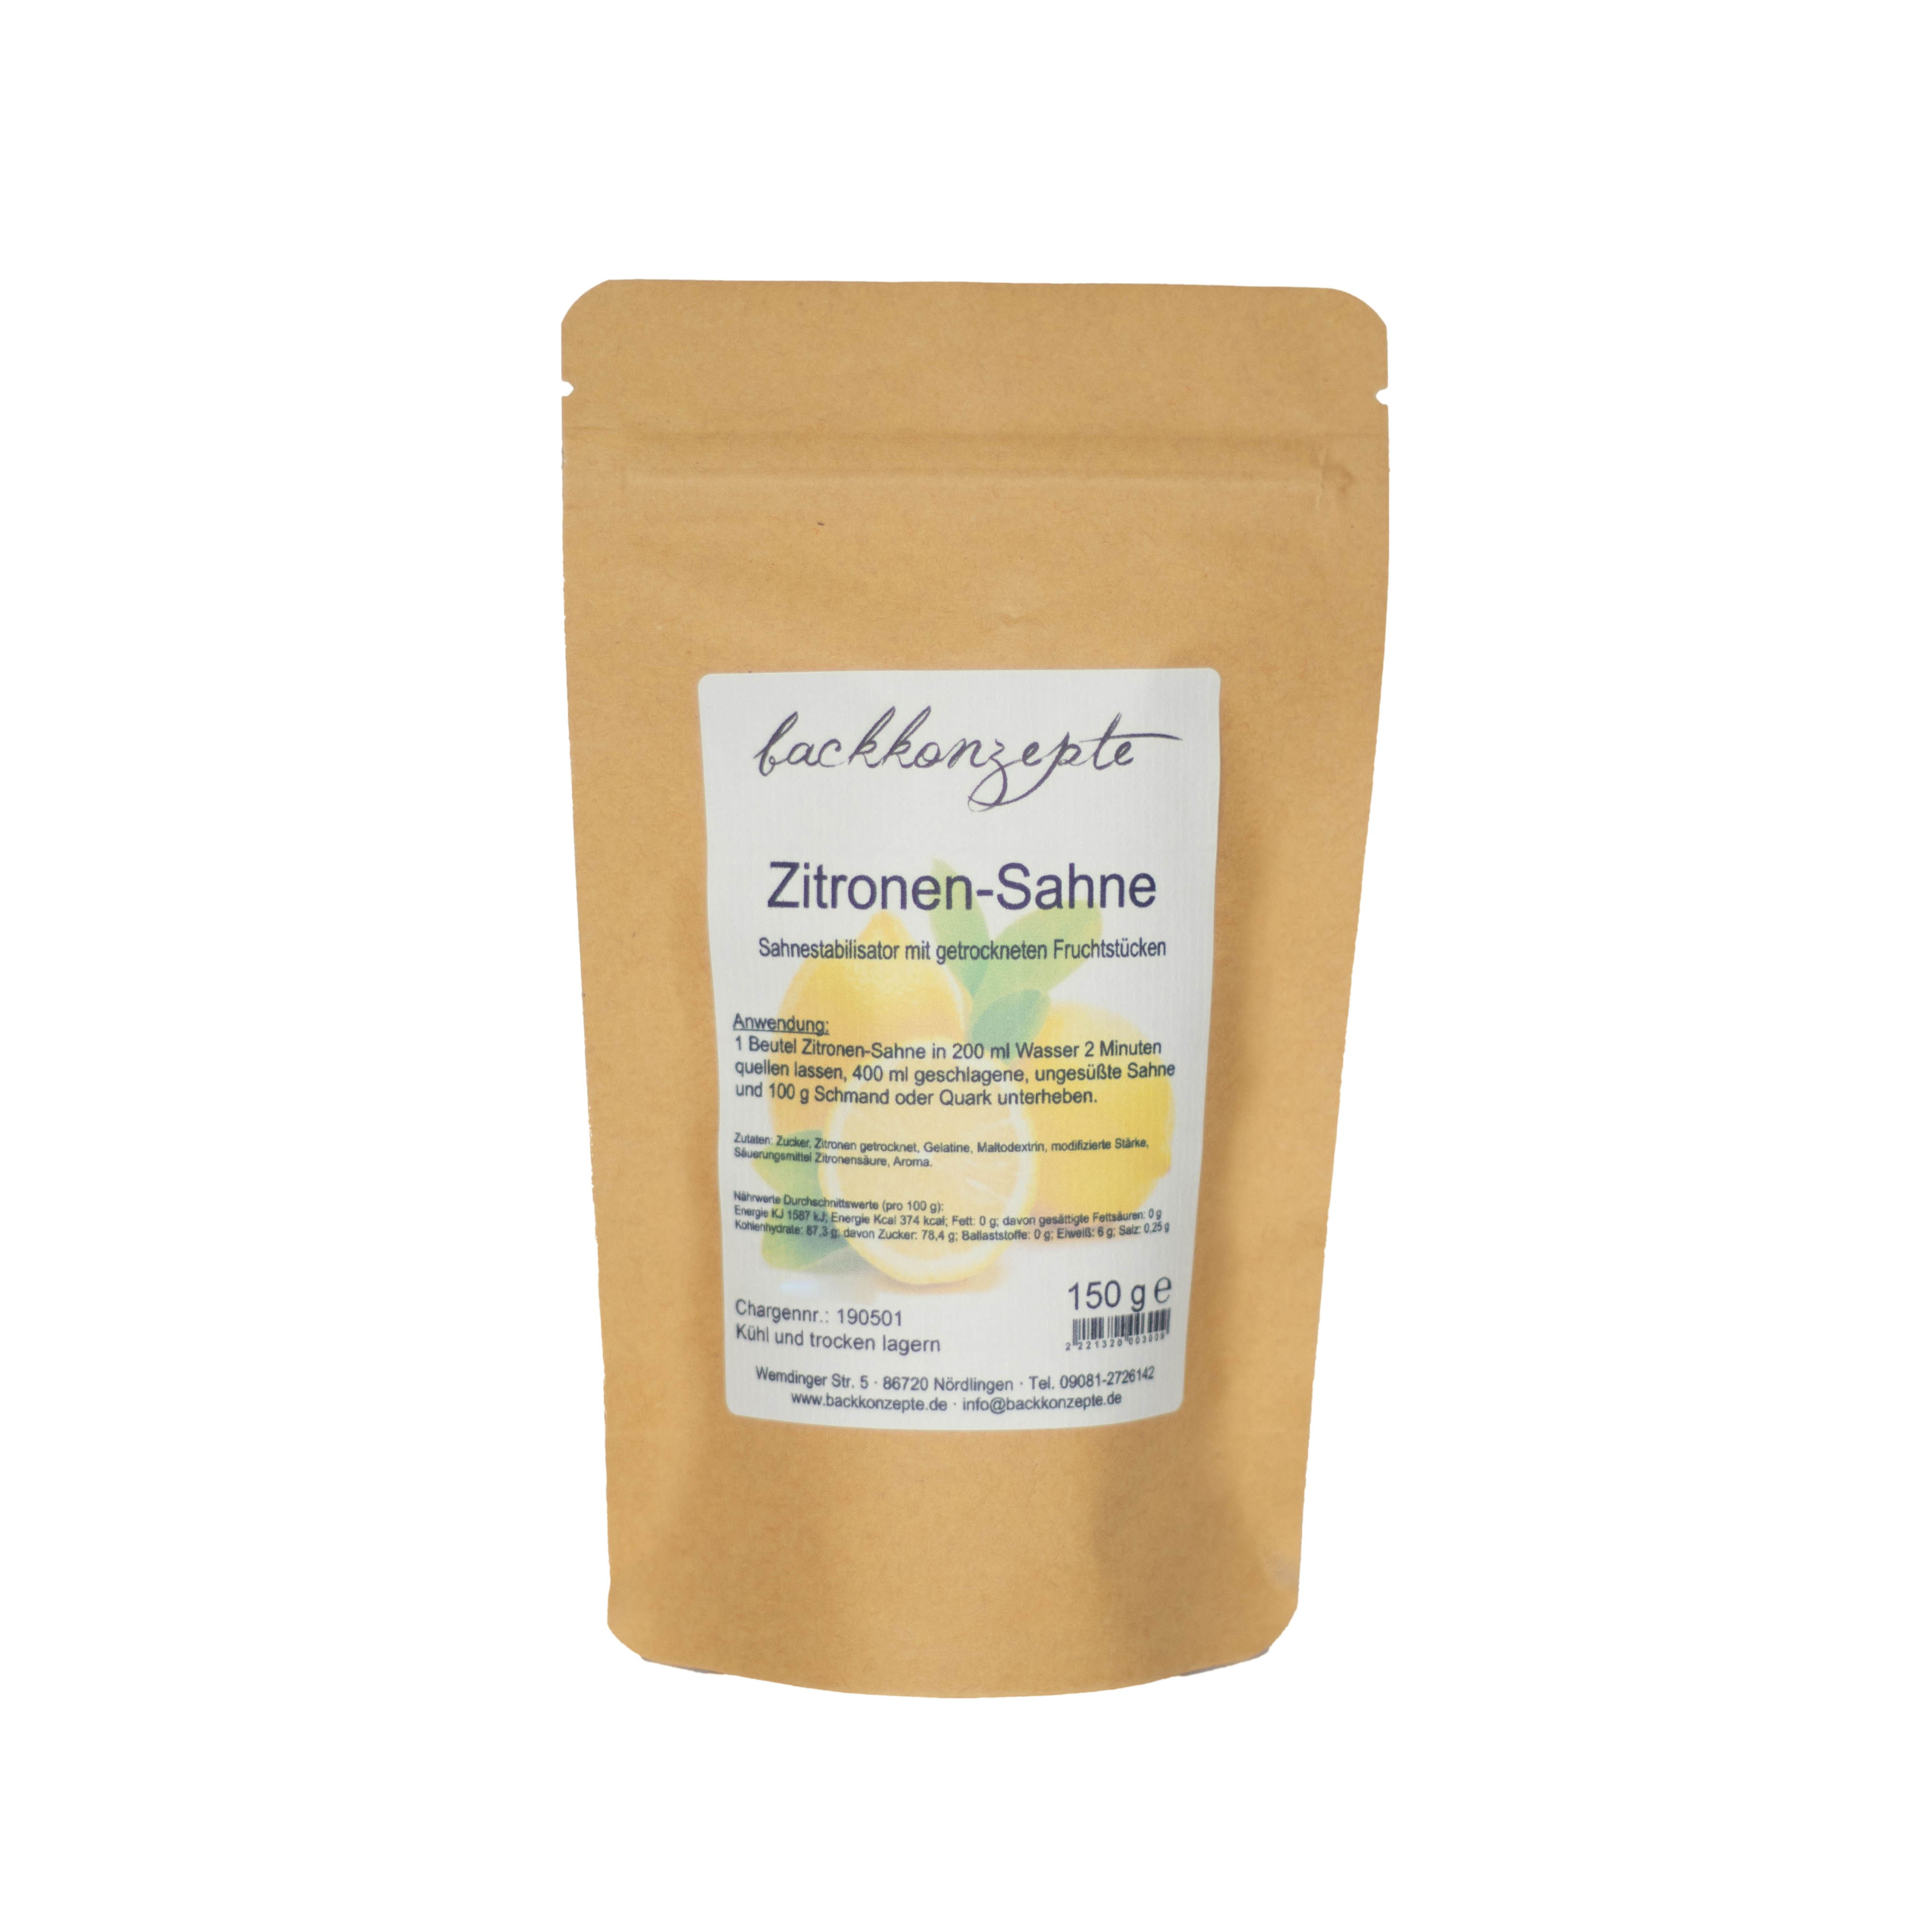 Zitronen-Sahne 150g